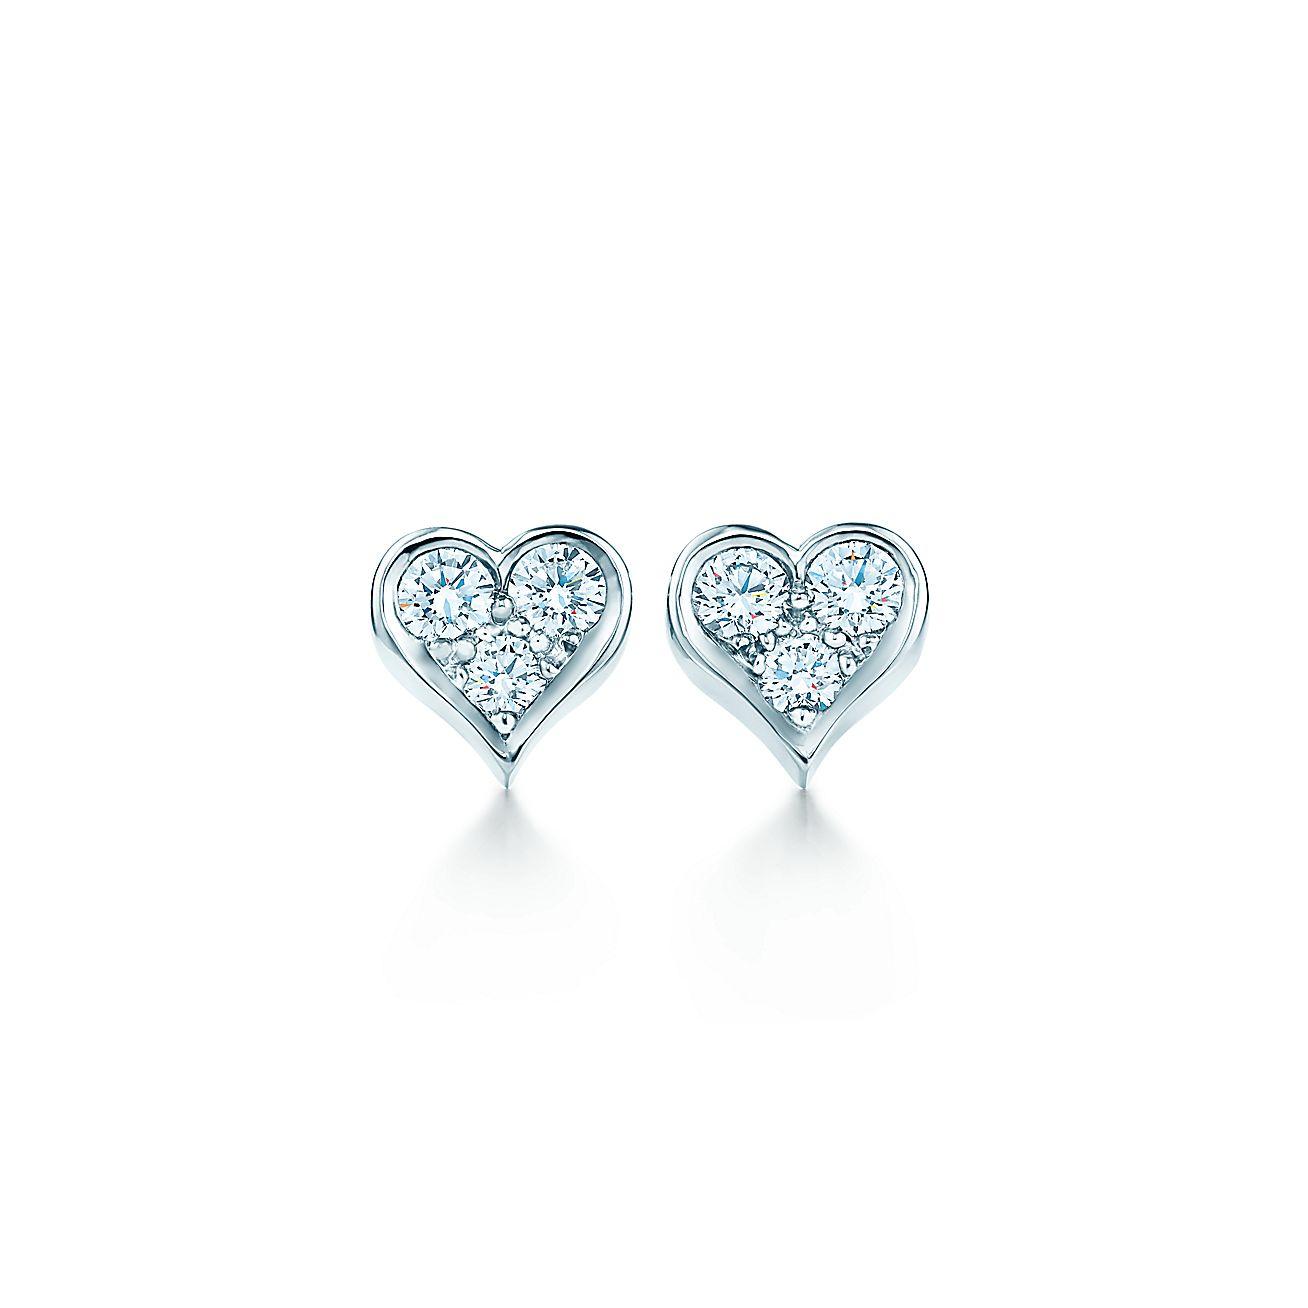 Diamond heart earrings - Diamond Heart Earrings 21